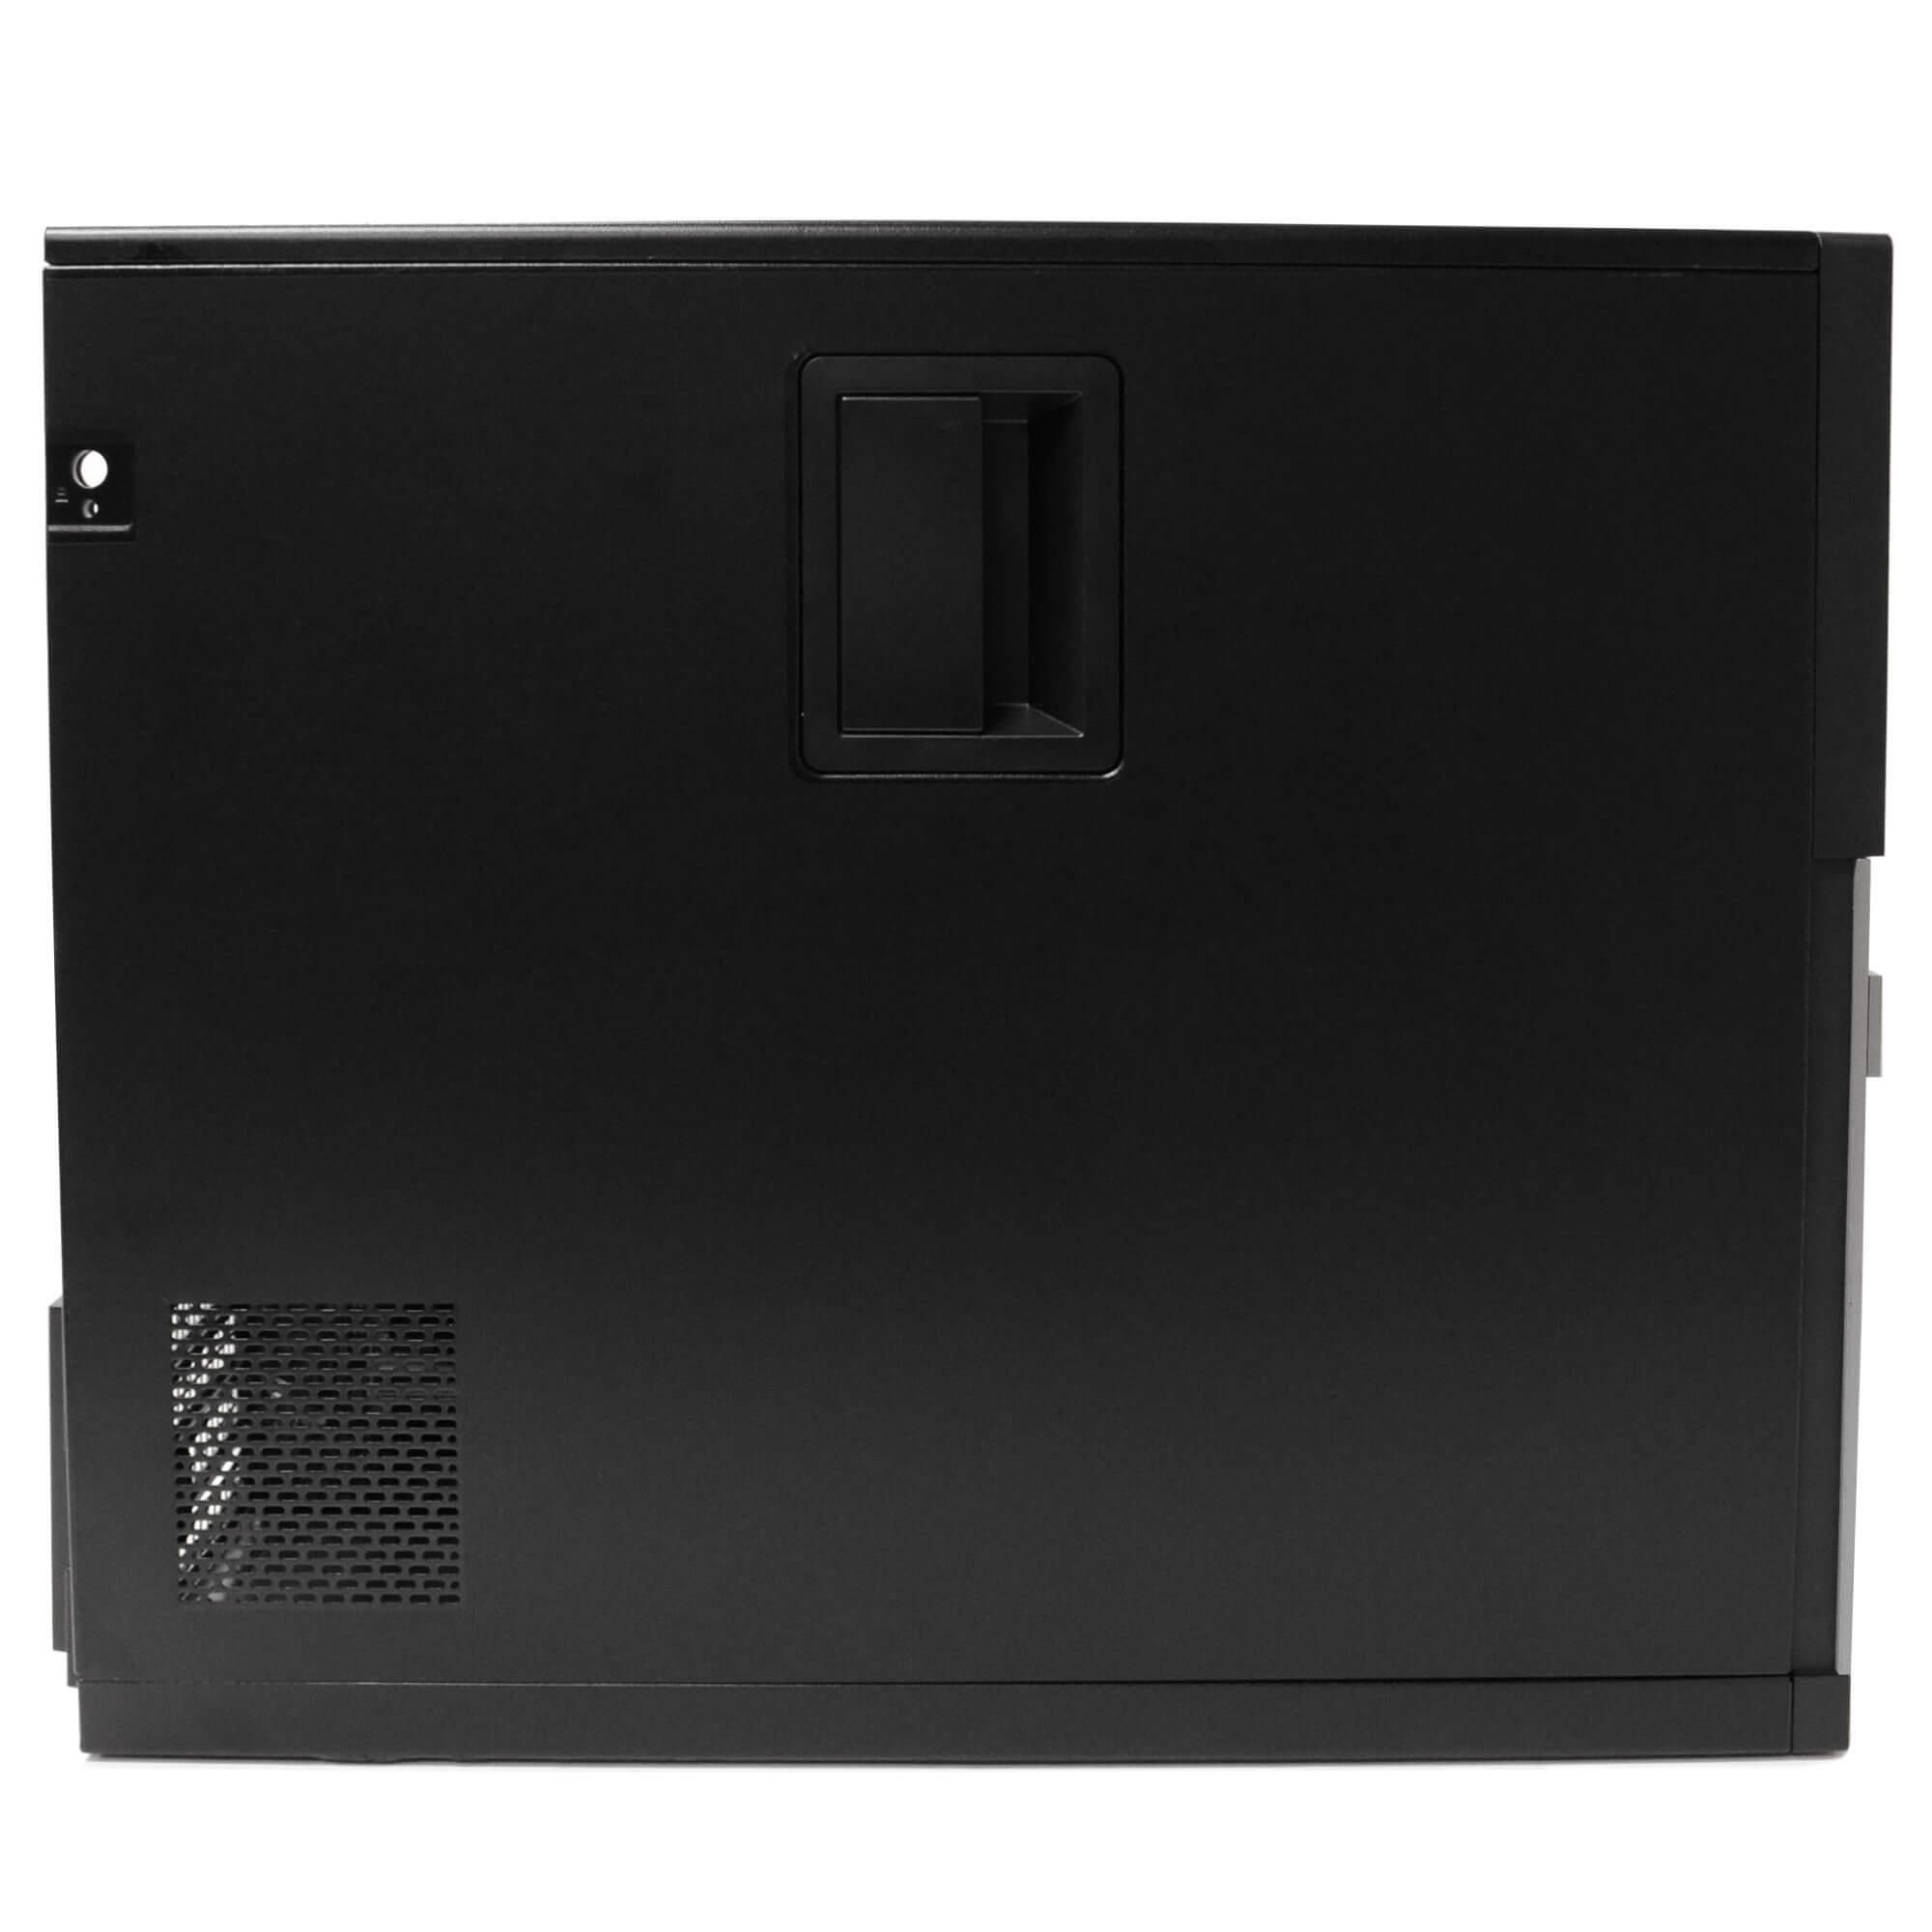 Dell 7010 Intel  i5 32GB 1TB HDD Windows 10 Home WiFi Tower PC